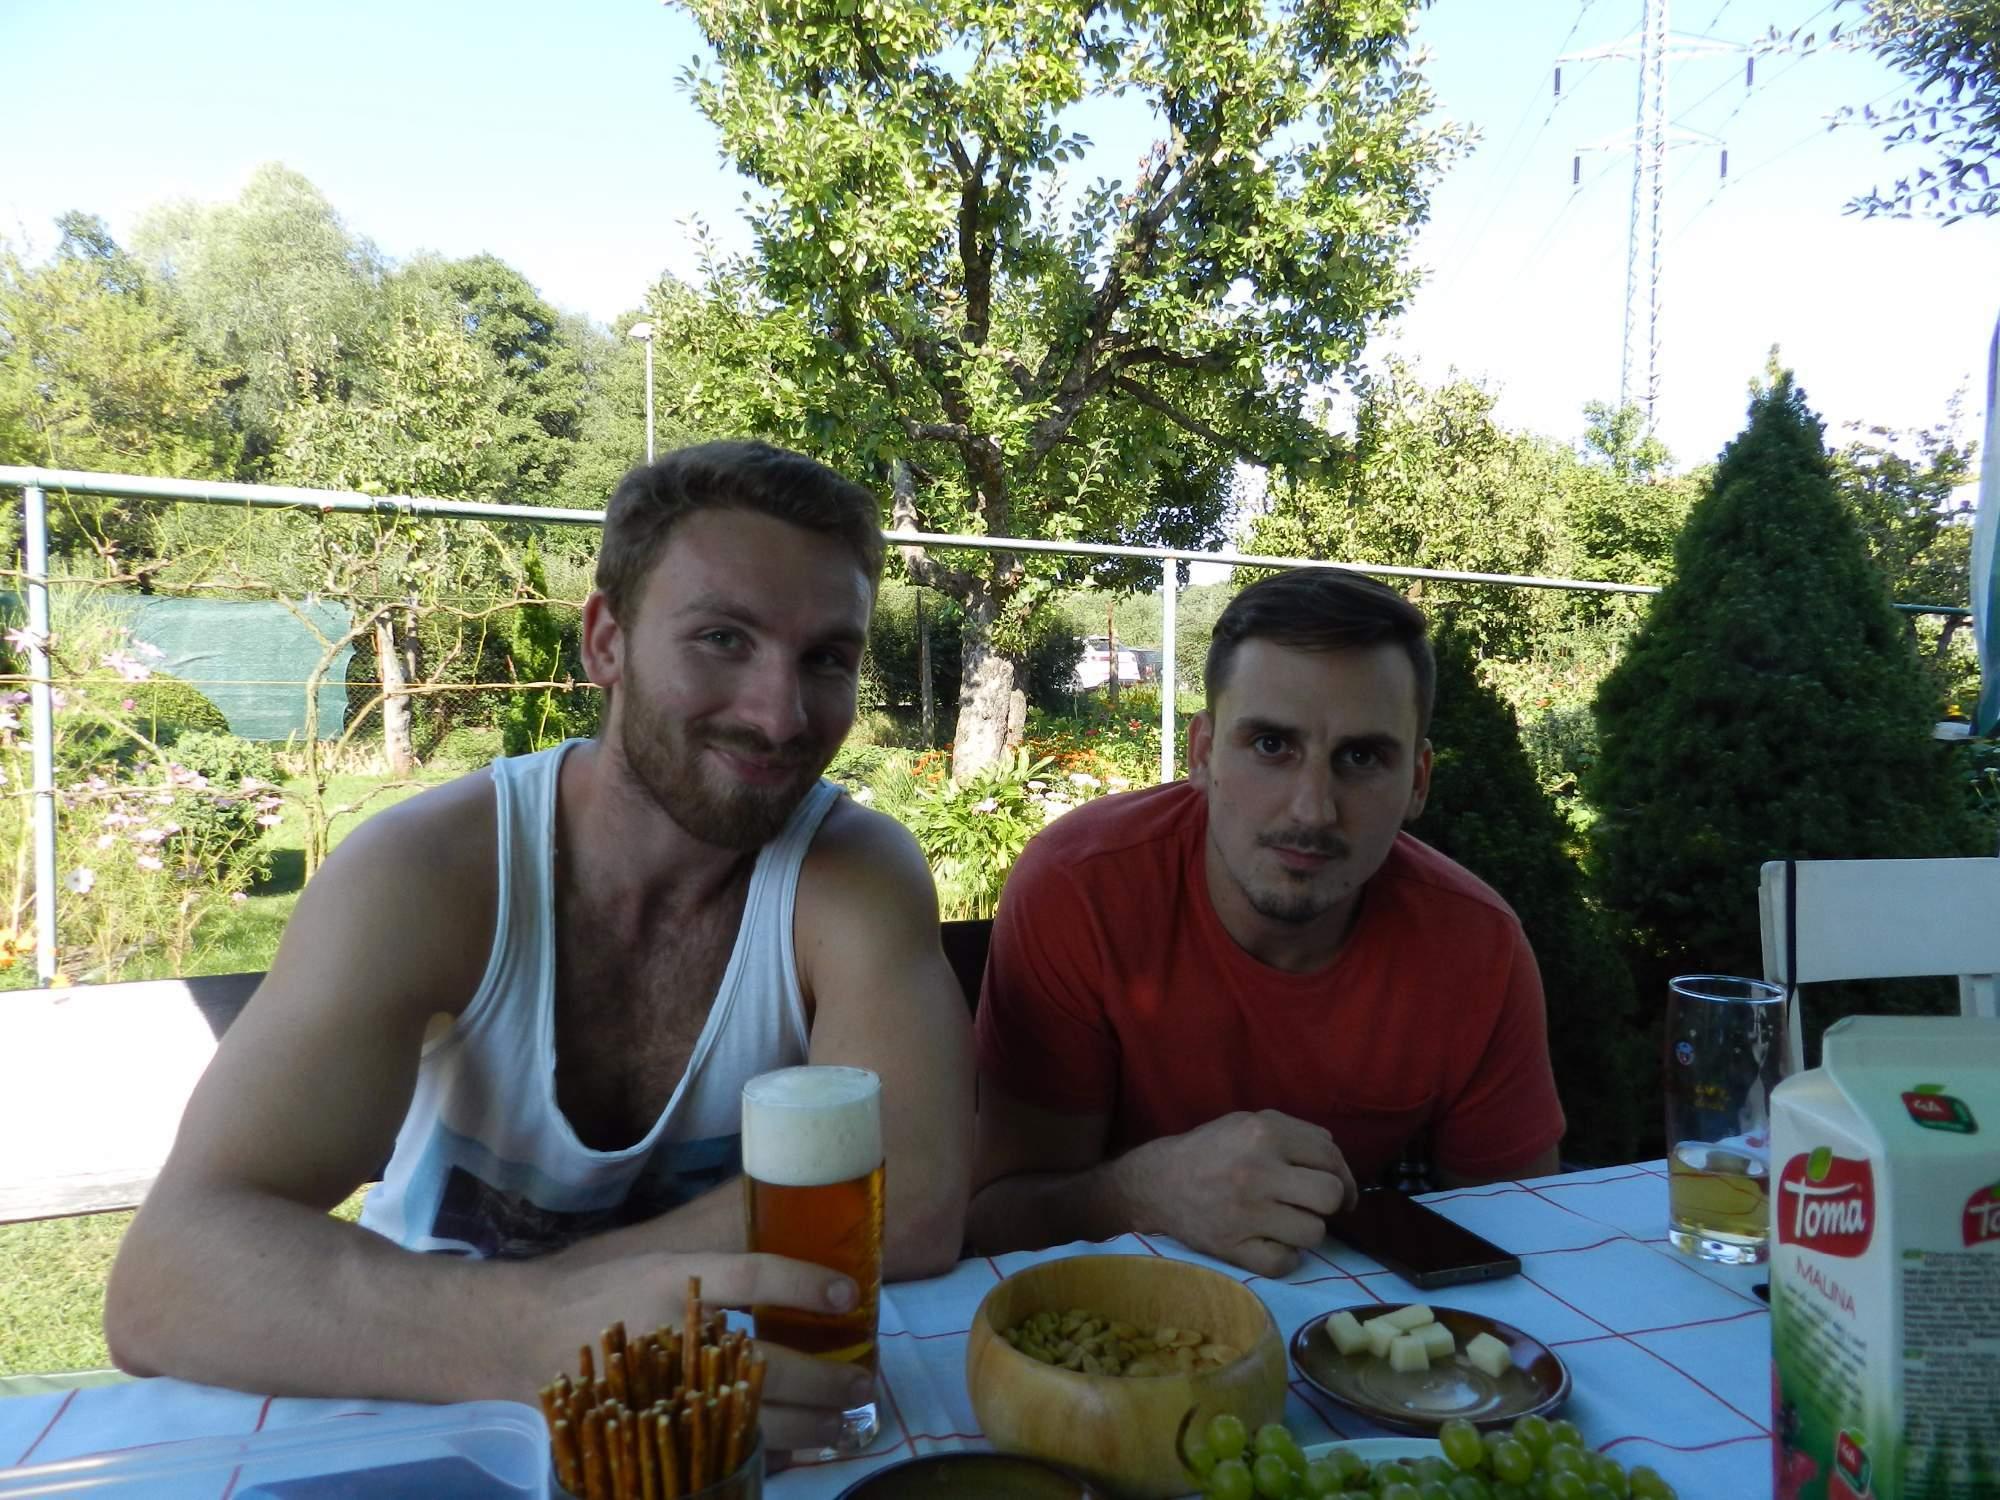 děti podzim 2016 - tomas2805 - album na Rajčeti